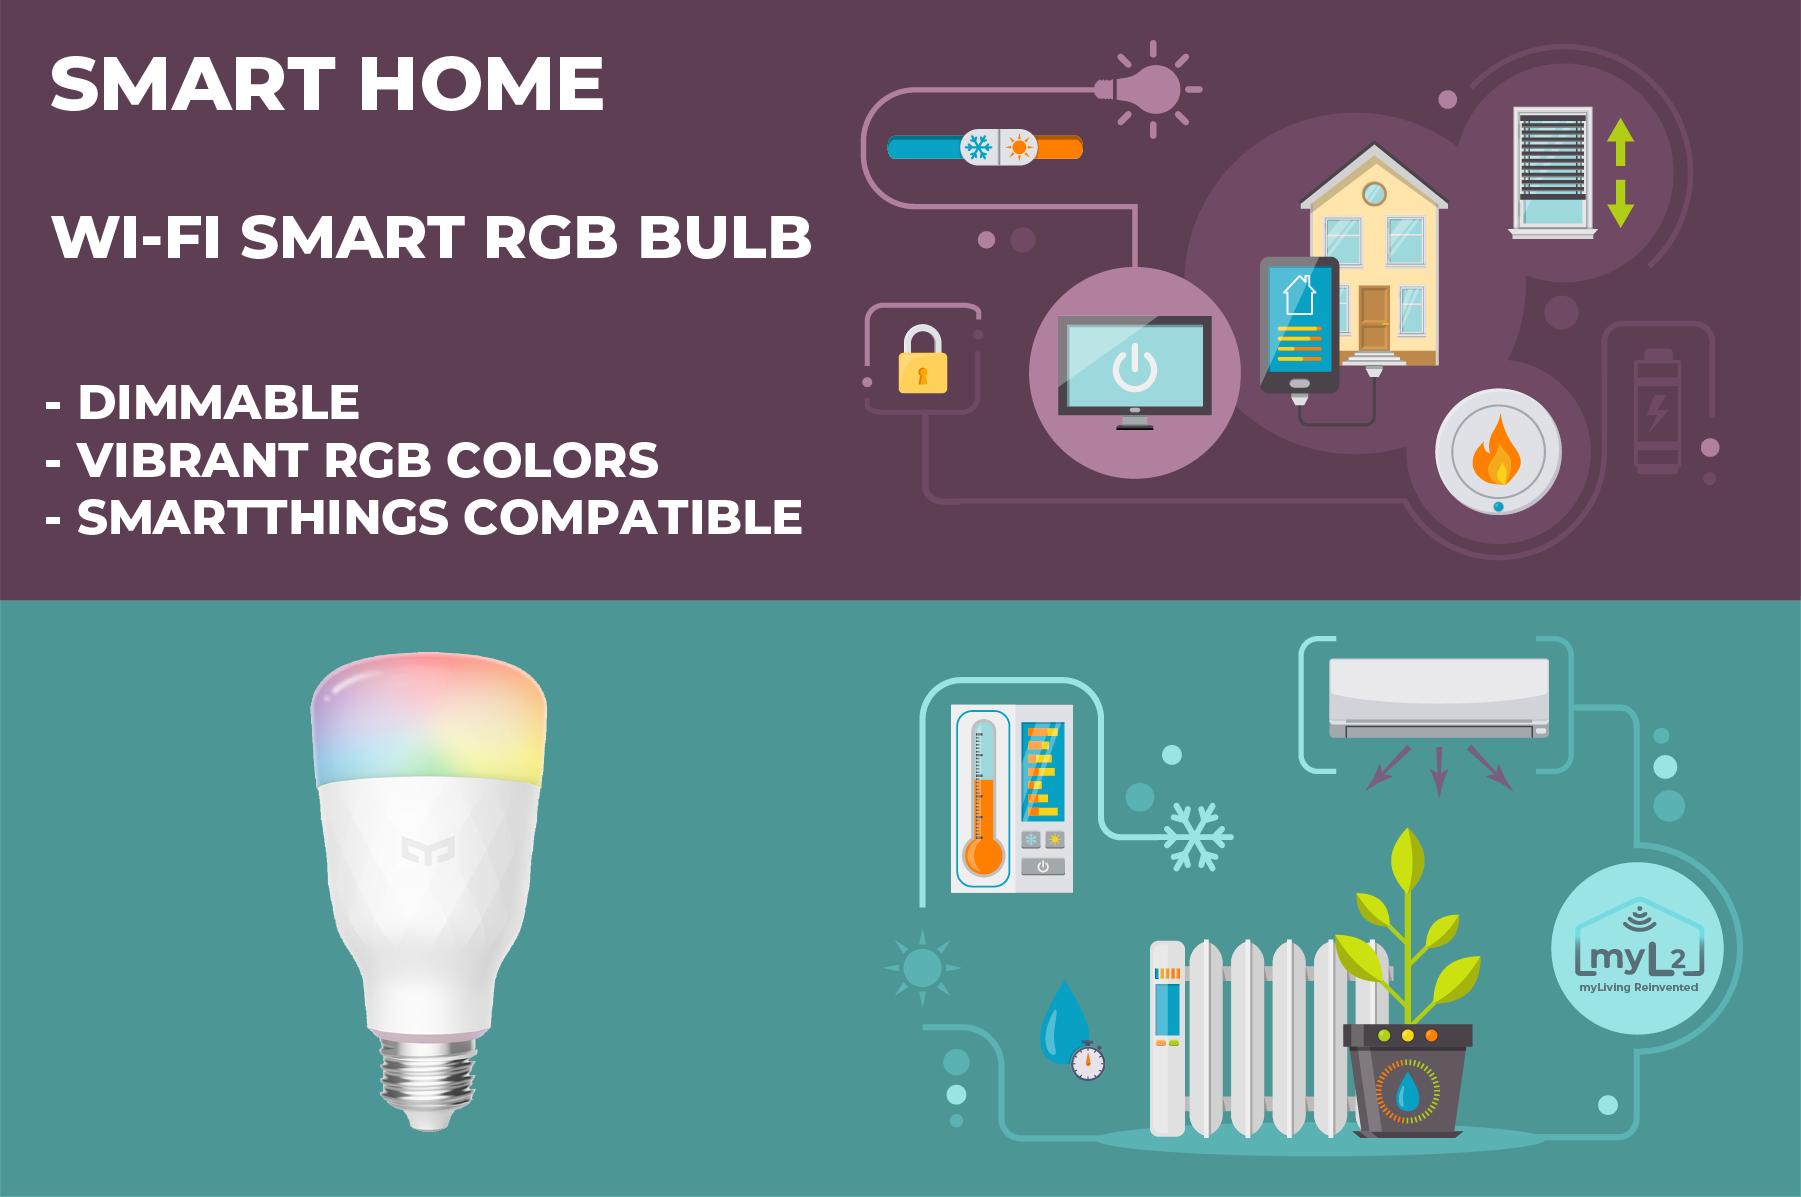 smart bulb xiaomi yeelight e27 8.5w rgb wifi smartthings